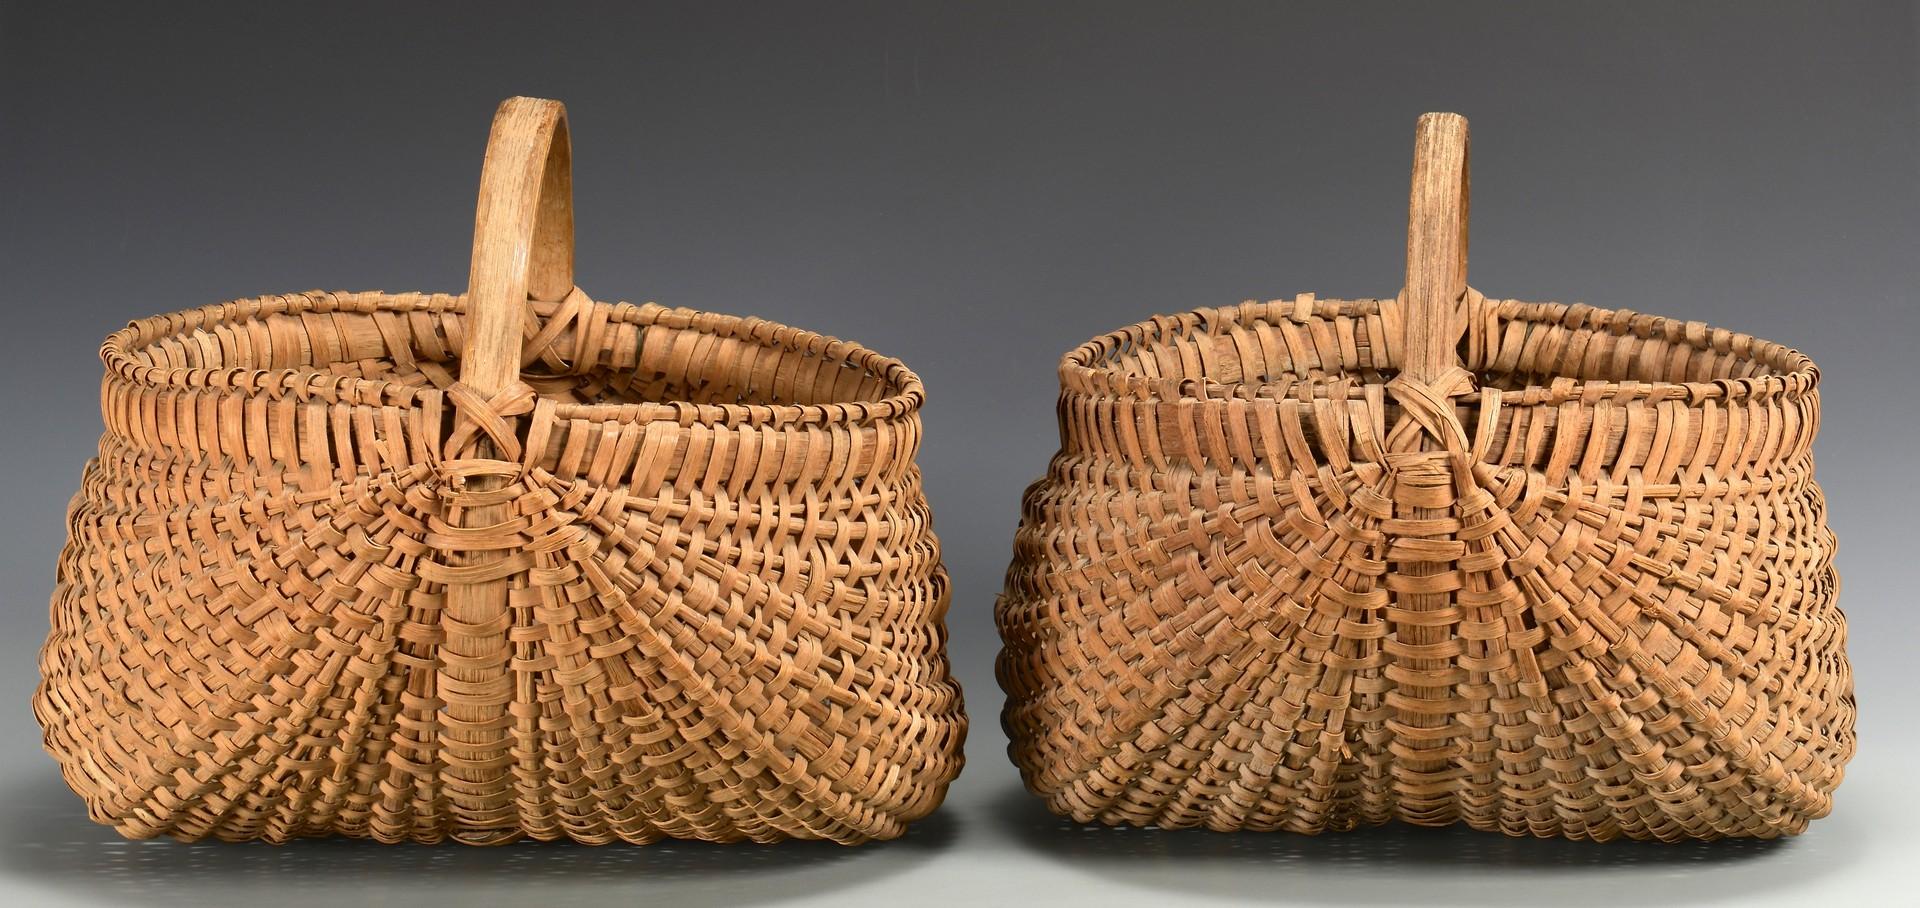 Lot 3832458: 2 Anderson County, TN Buttocks Baskets